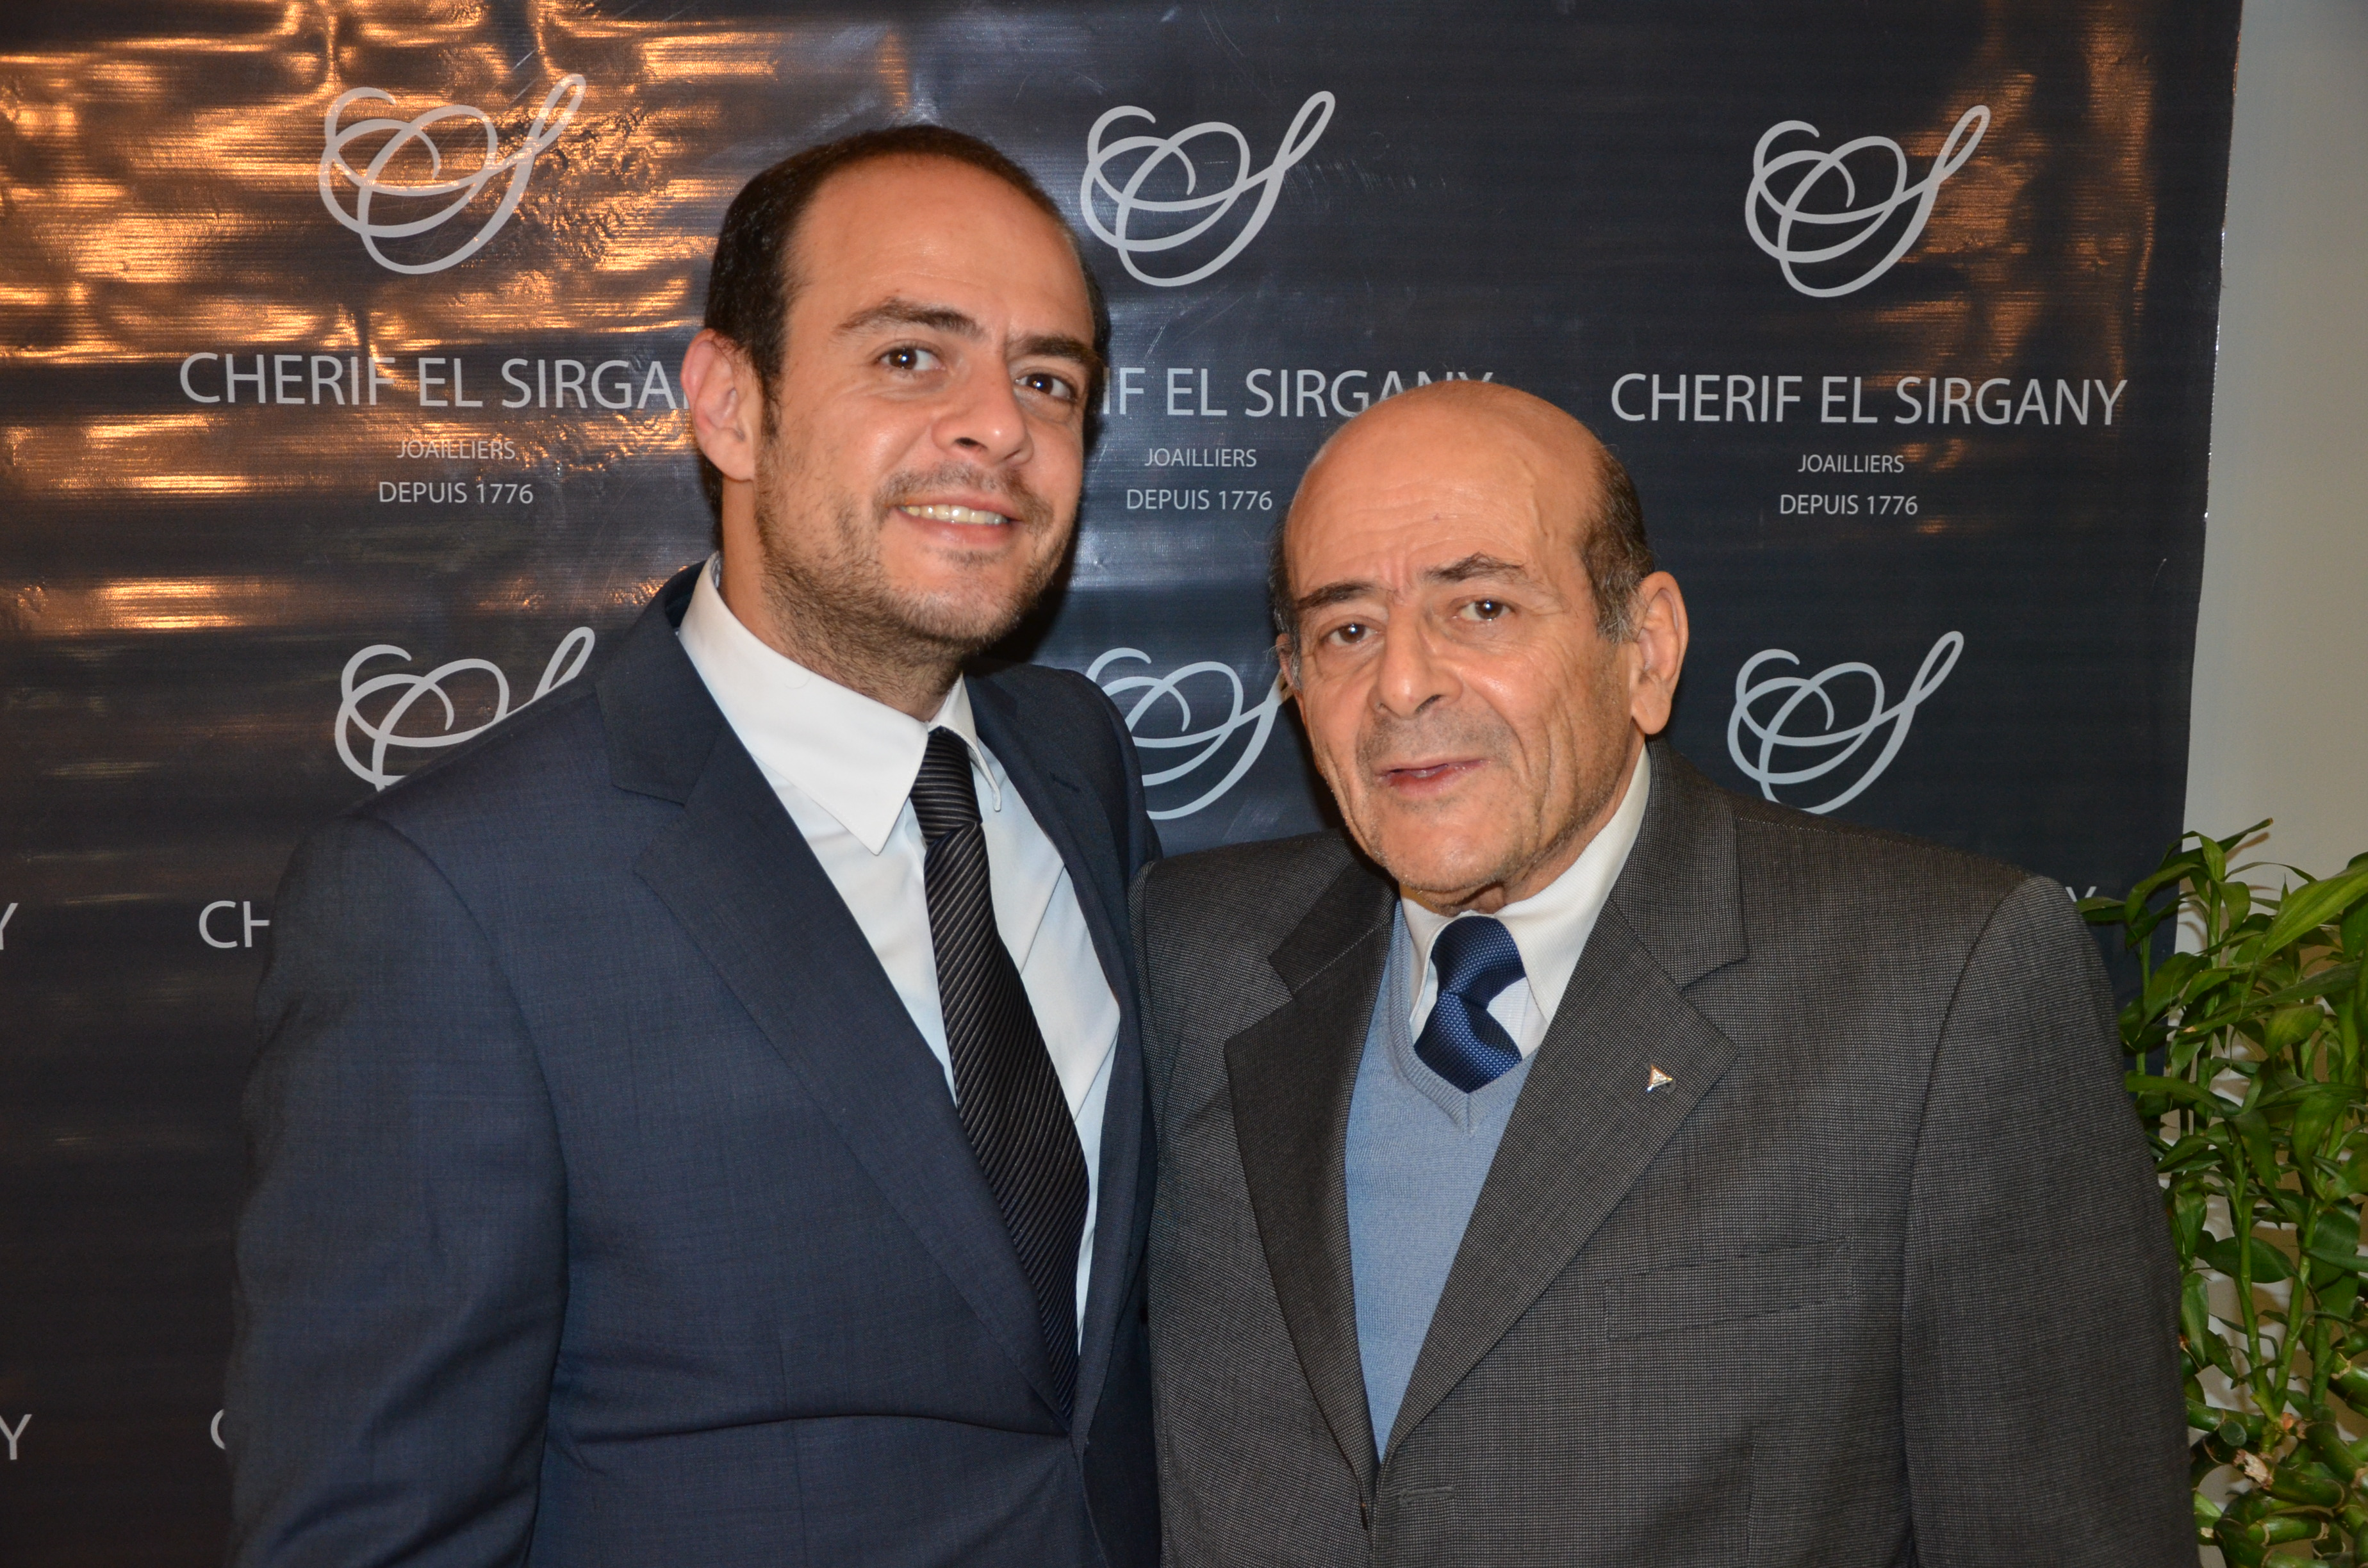 Mr. Mahmoud El Sirgany & Mr. Cherif El Sirgany